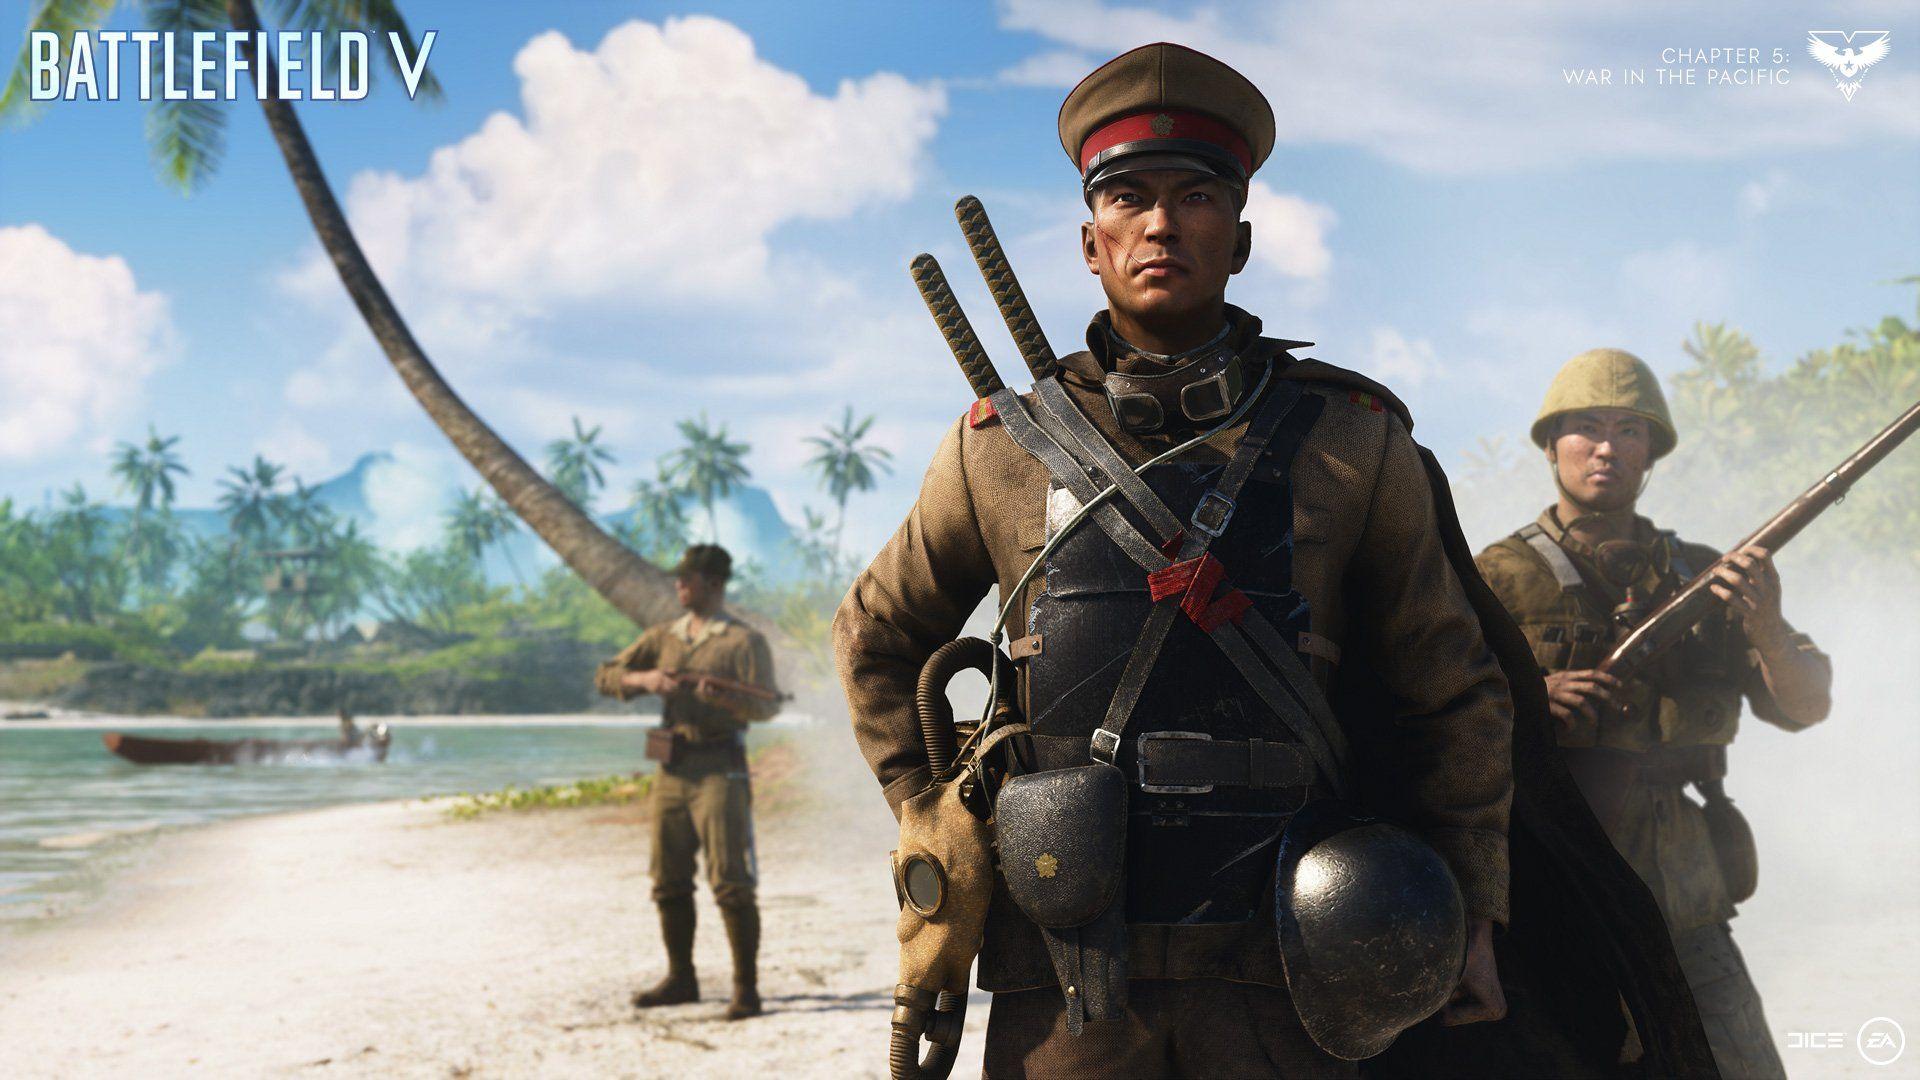 Prueba gratis Battlefield V en todas las plataformas